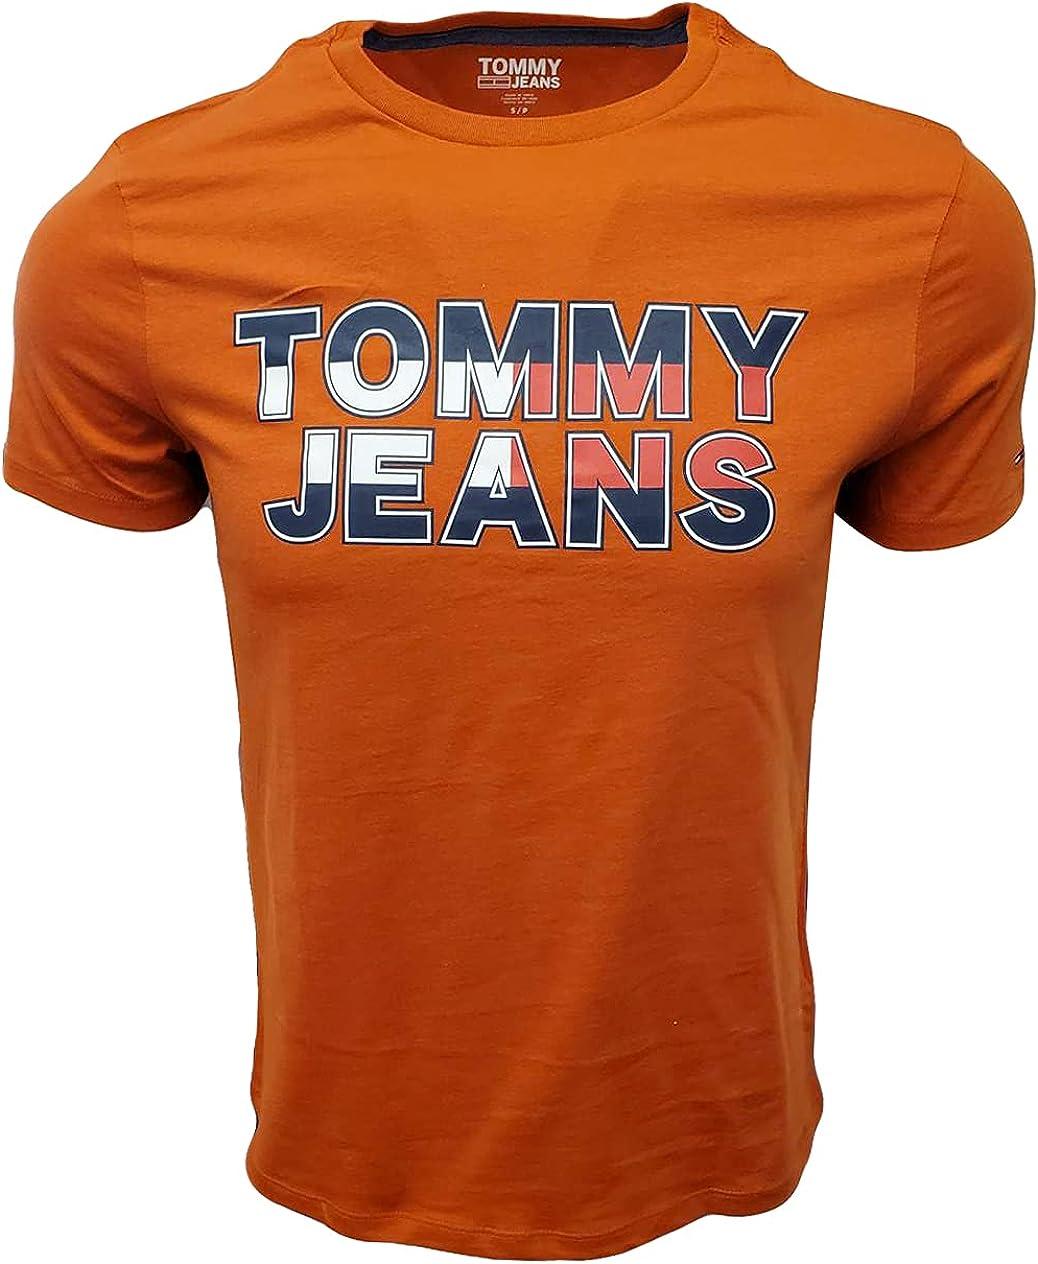 Tommy Hilfiger Men's Tommy Jeans T-Shirt